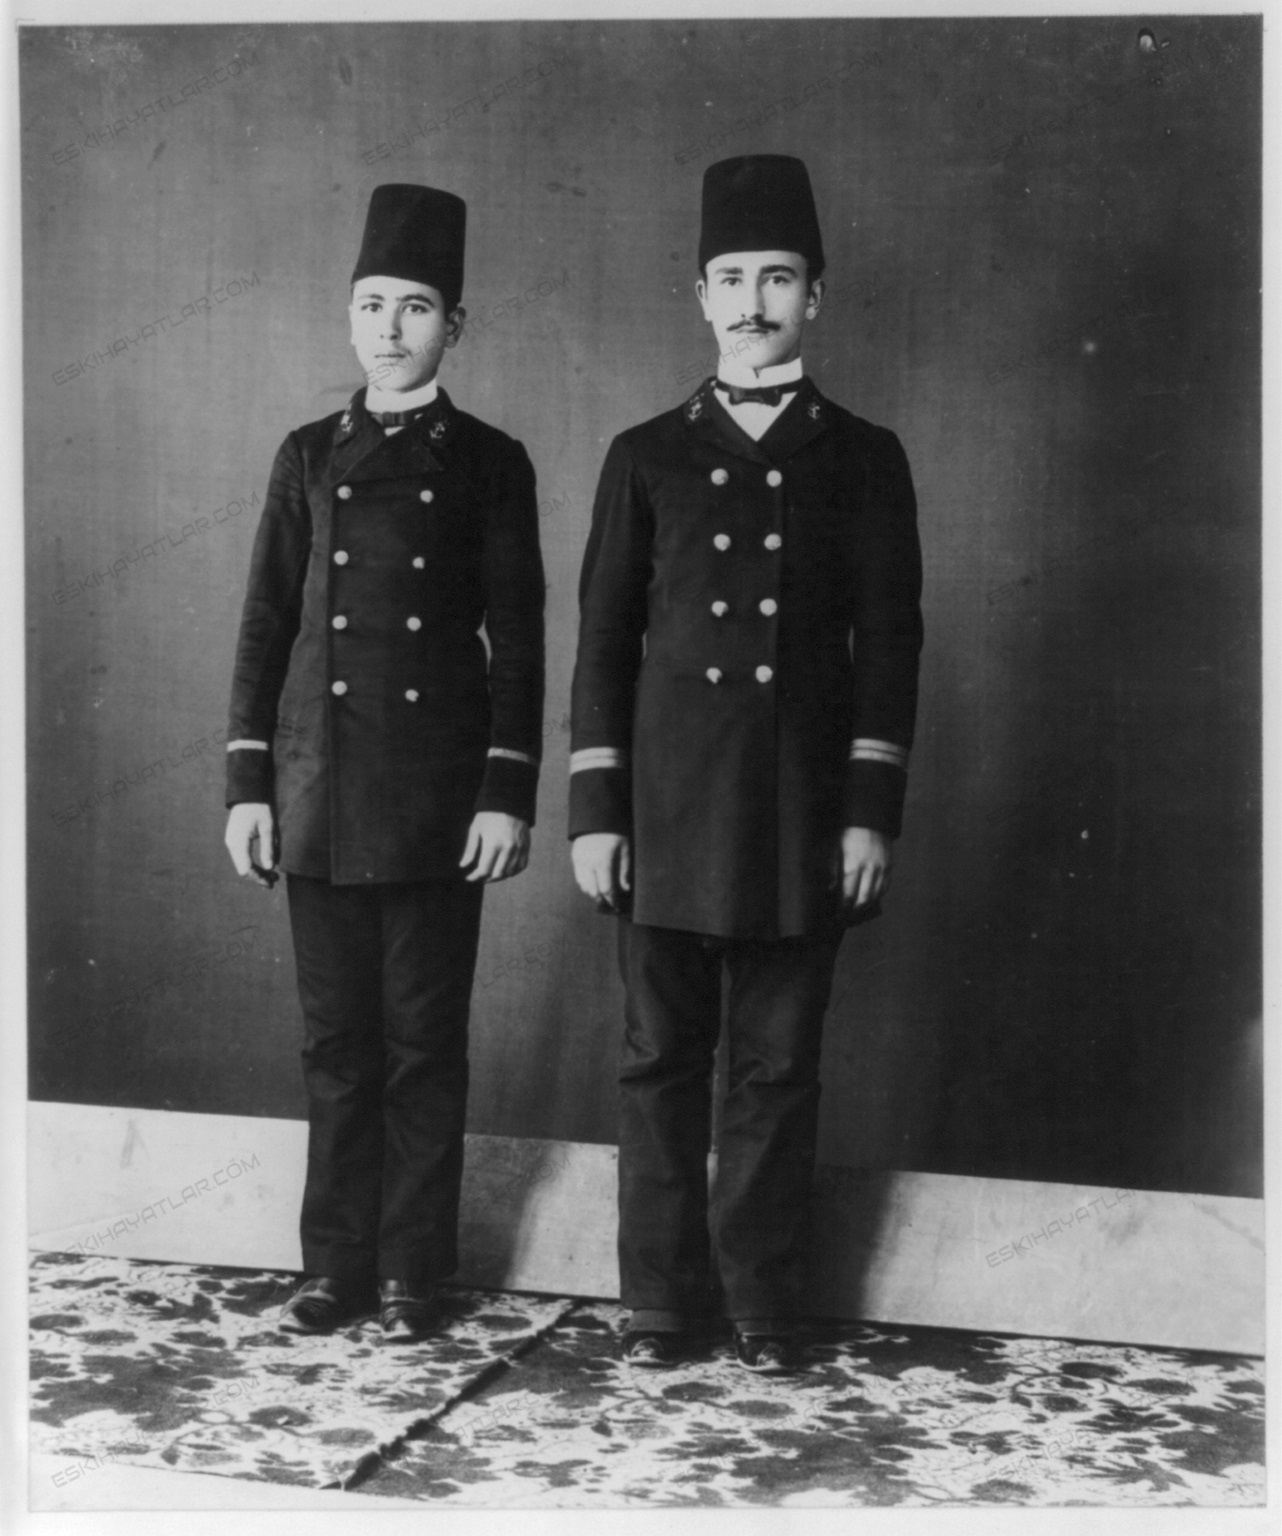 0369-sultan-abdulhamid-vefatinin-100-yili-yedi-kita-dergisi-abdulhamid-belgeseli (41)